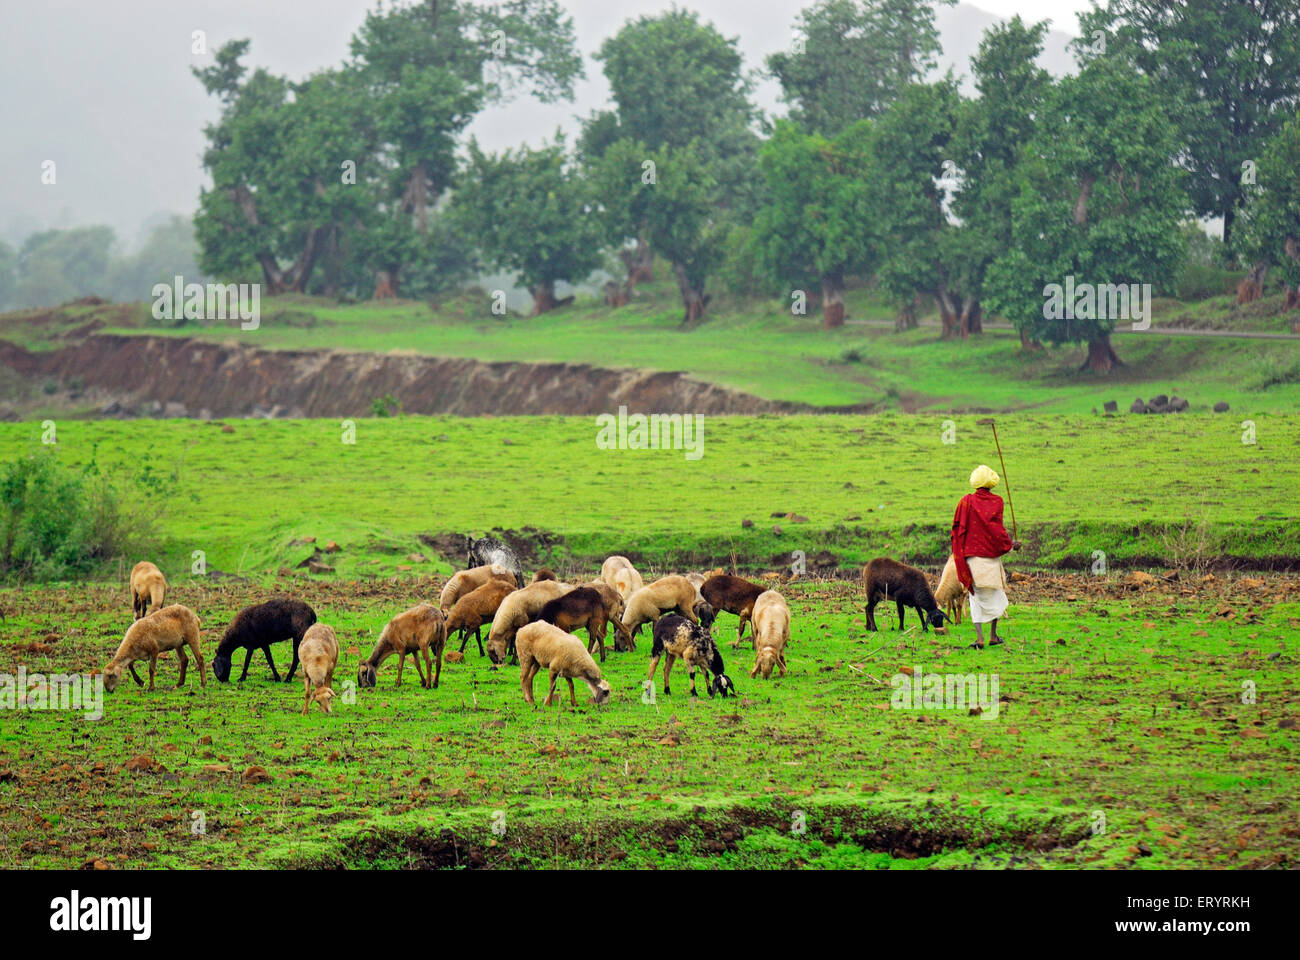 Shepherd with sheep grazing ; Shahapur ; Thane ; Maharashtra ; India 4 July 2009 - Stock Image